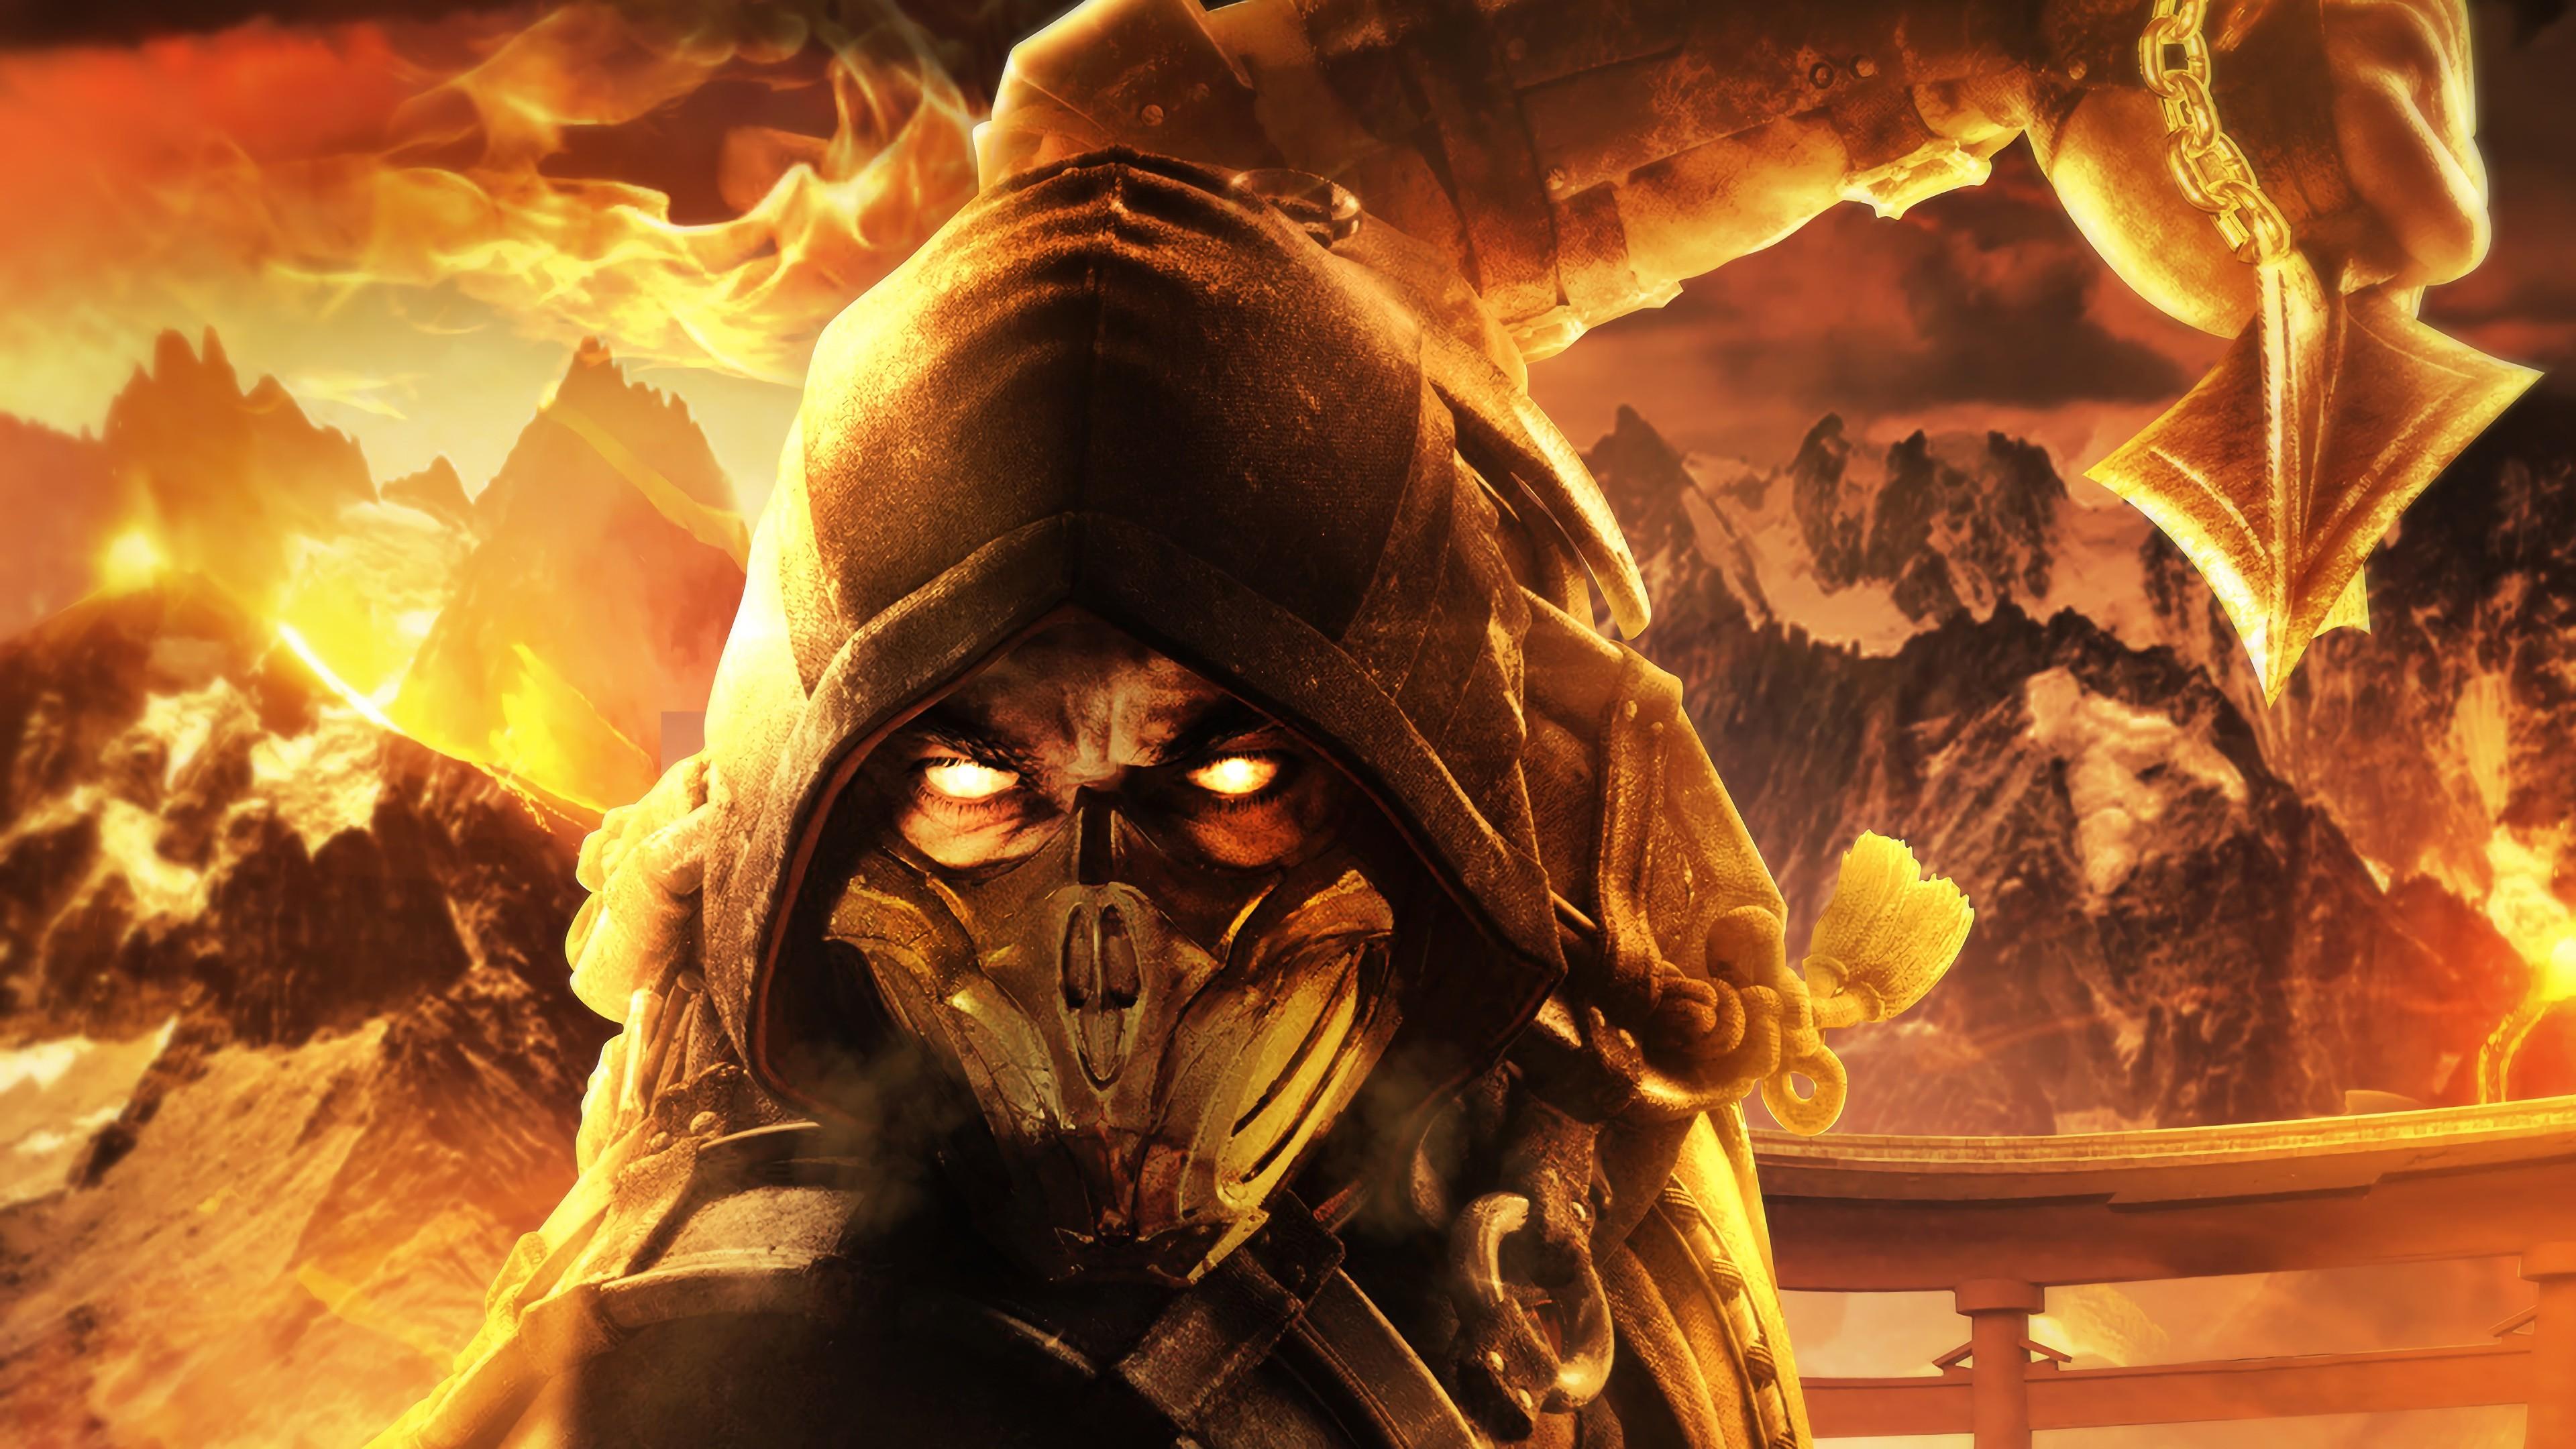 Iphone Mortal Kombat 11 Hd Wallpaper Wallpapershit